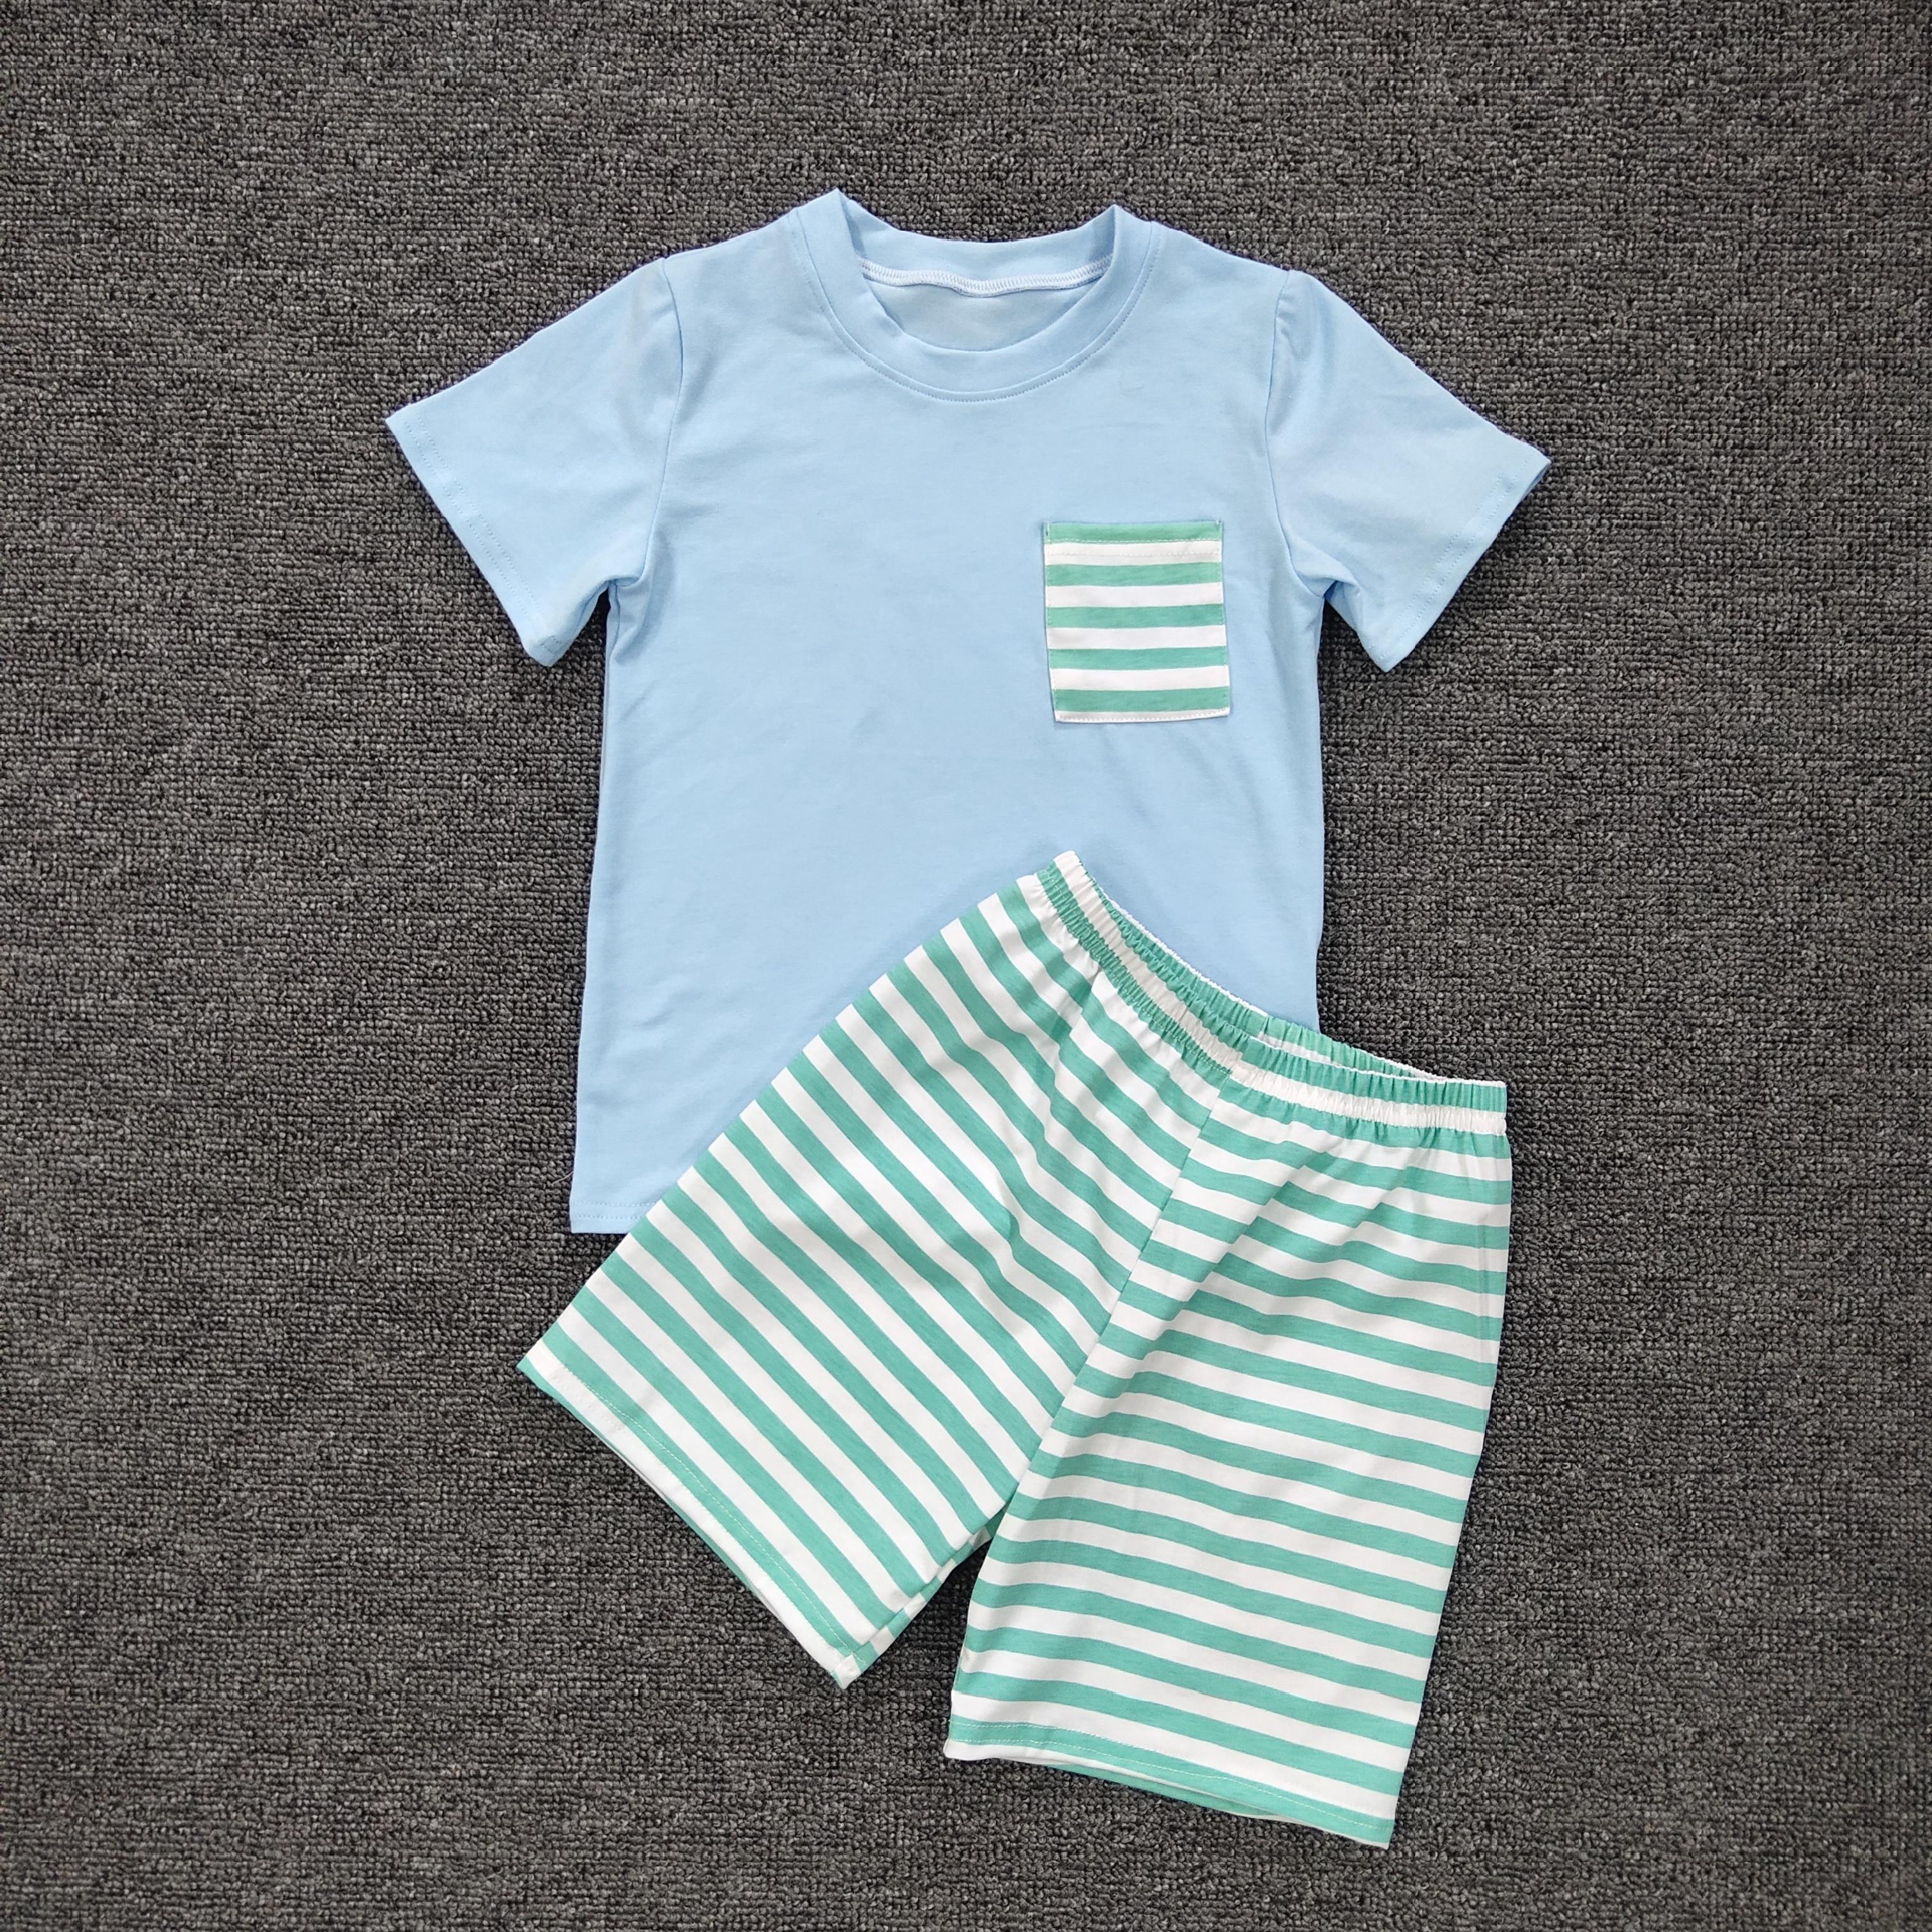 Baby Boys Suit Clothes Newborn Infant Sets Baby Boy Clothes Outfit Clothes Spring Toddler Set Children Outfits